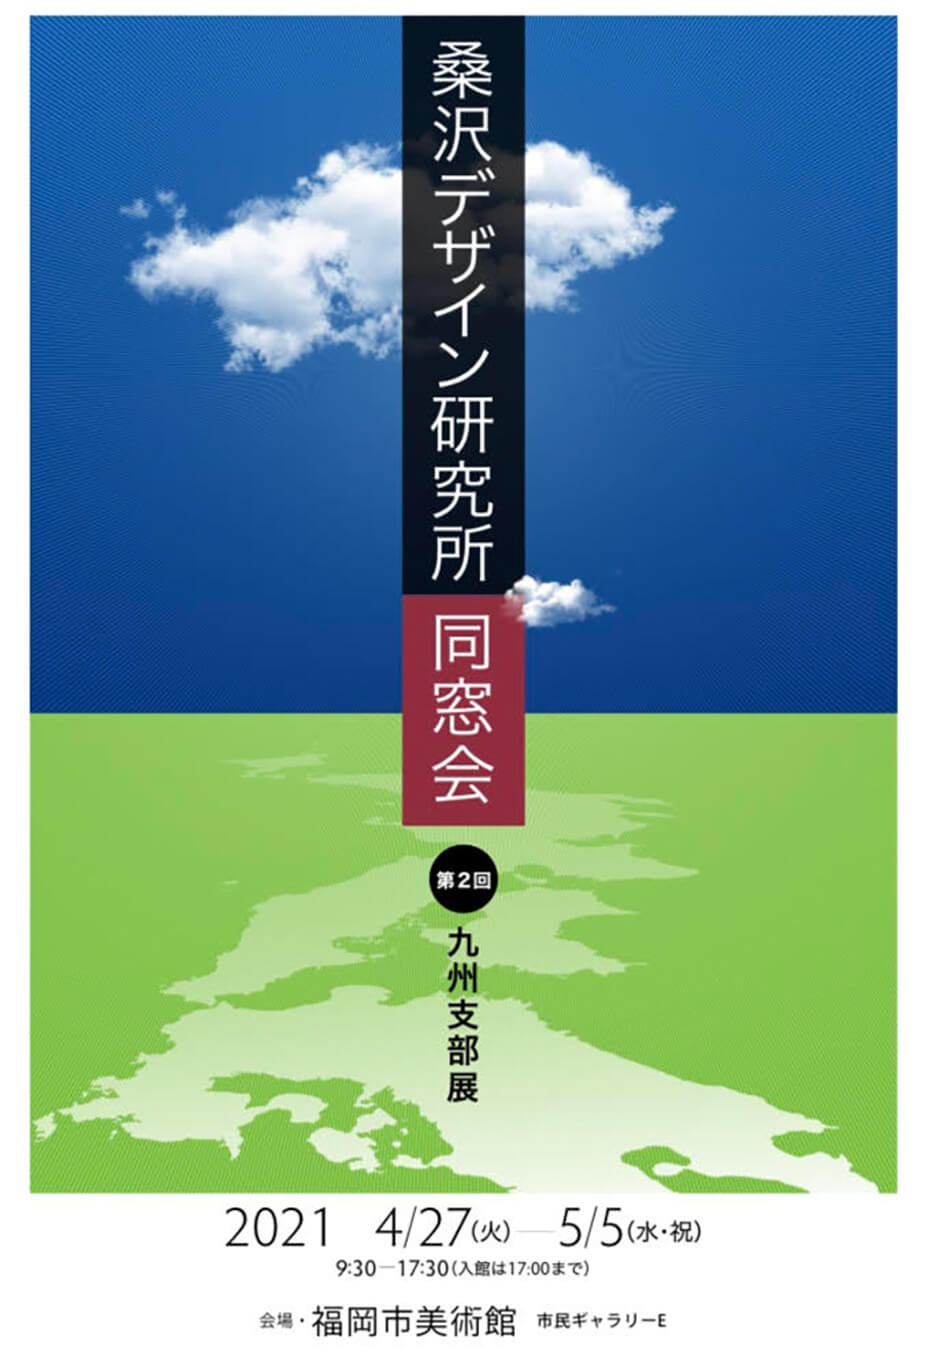 fam-202104-桑沢デザイン研究所同窓会第二回九州支部展